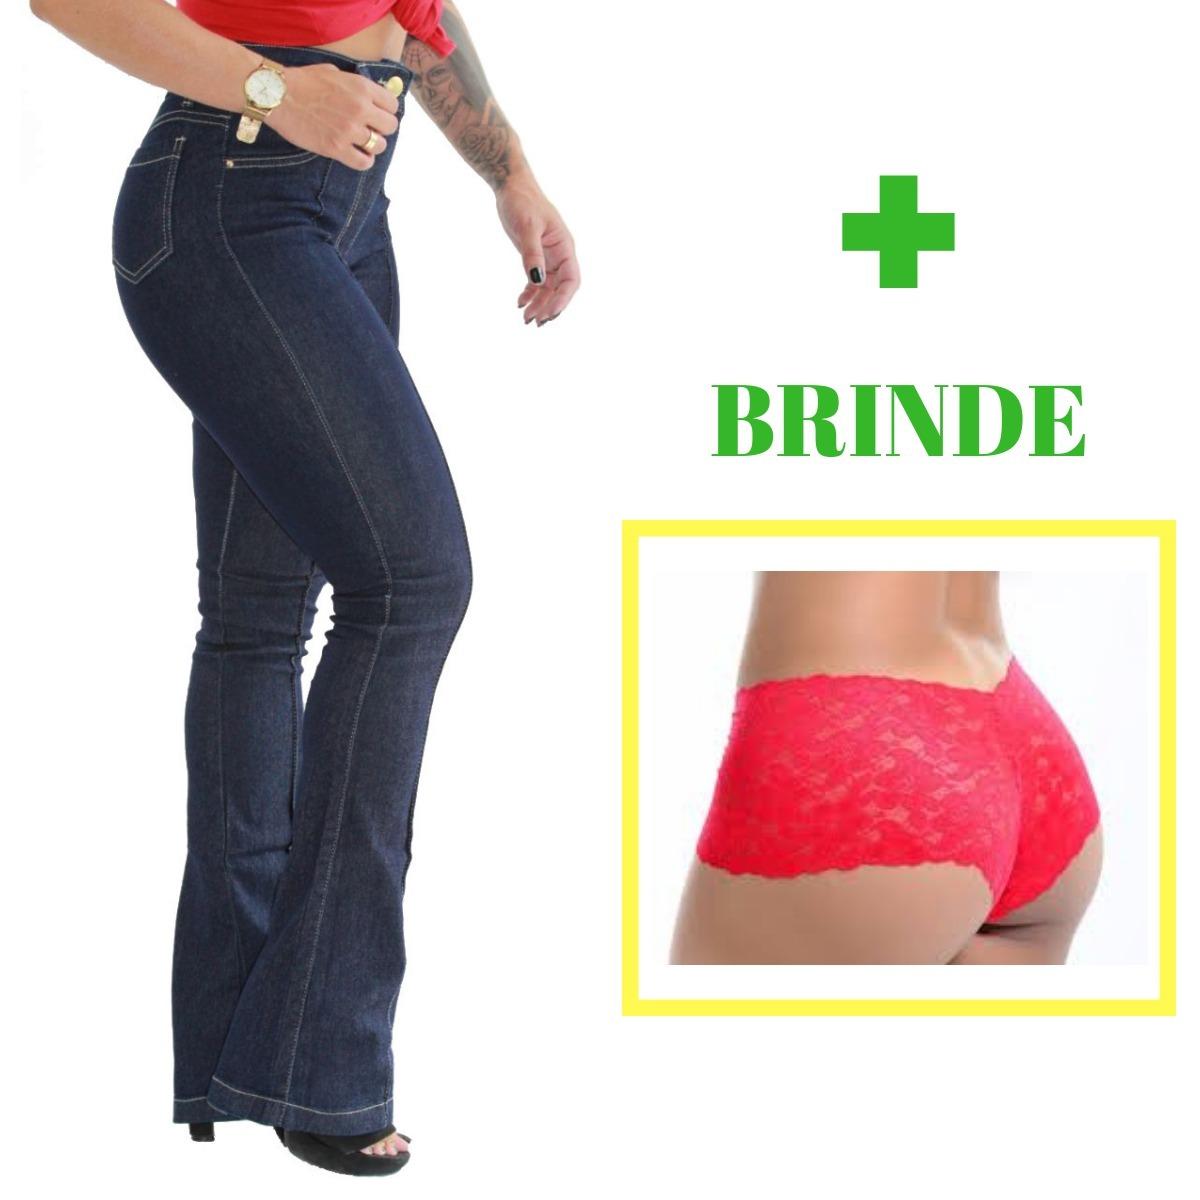 e30d9de8c calca boca de sino jeans feminina cintura alta linda. Carregando zoom.